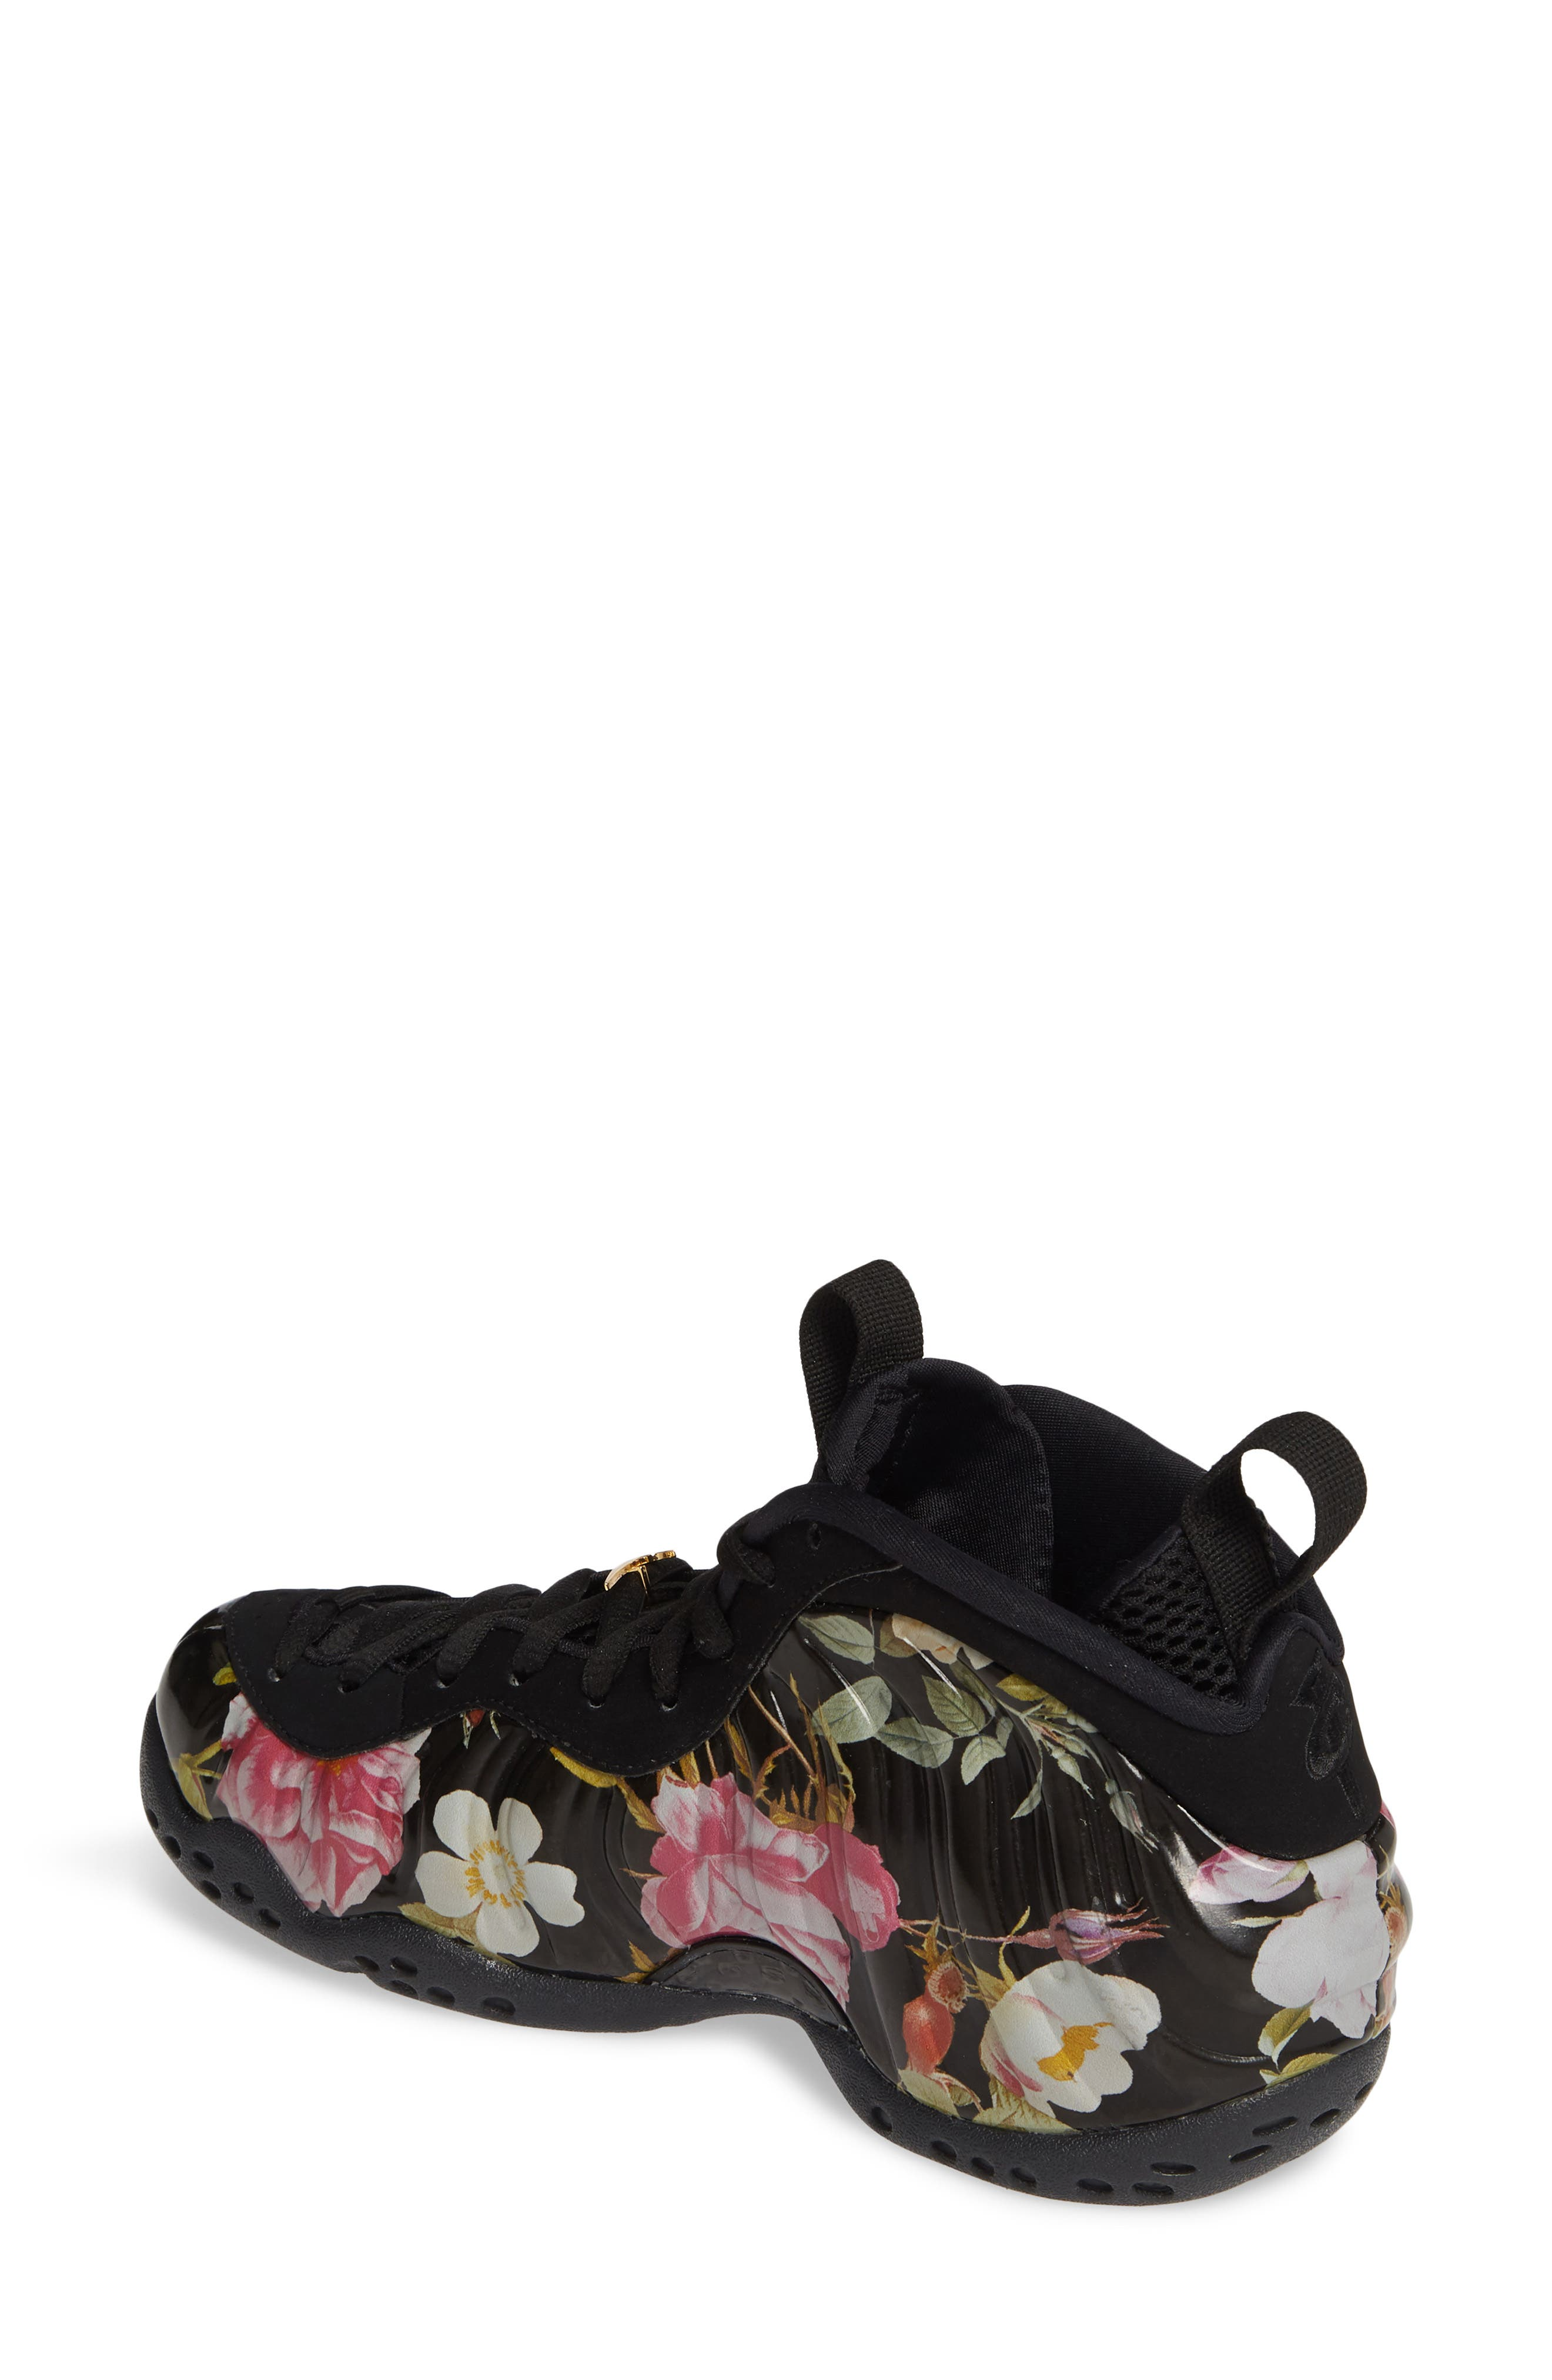 NIKE, Air Foamposite One Sneaker, Alternate thumbnail 2, color, BLACK/ BLACK-METALLIC GOLD